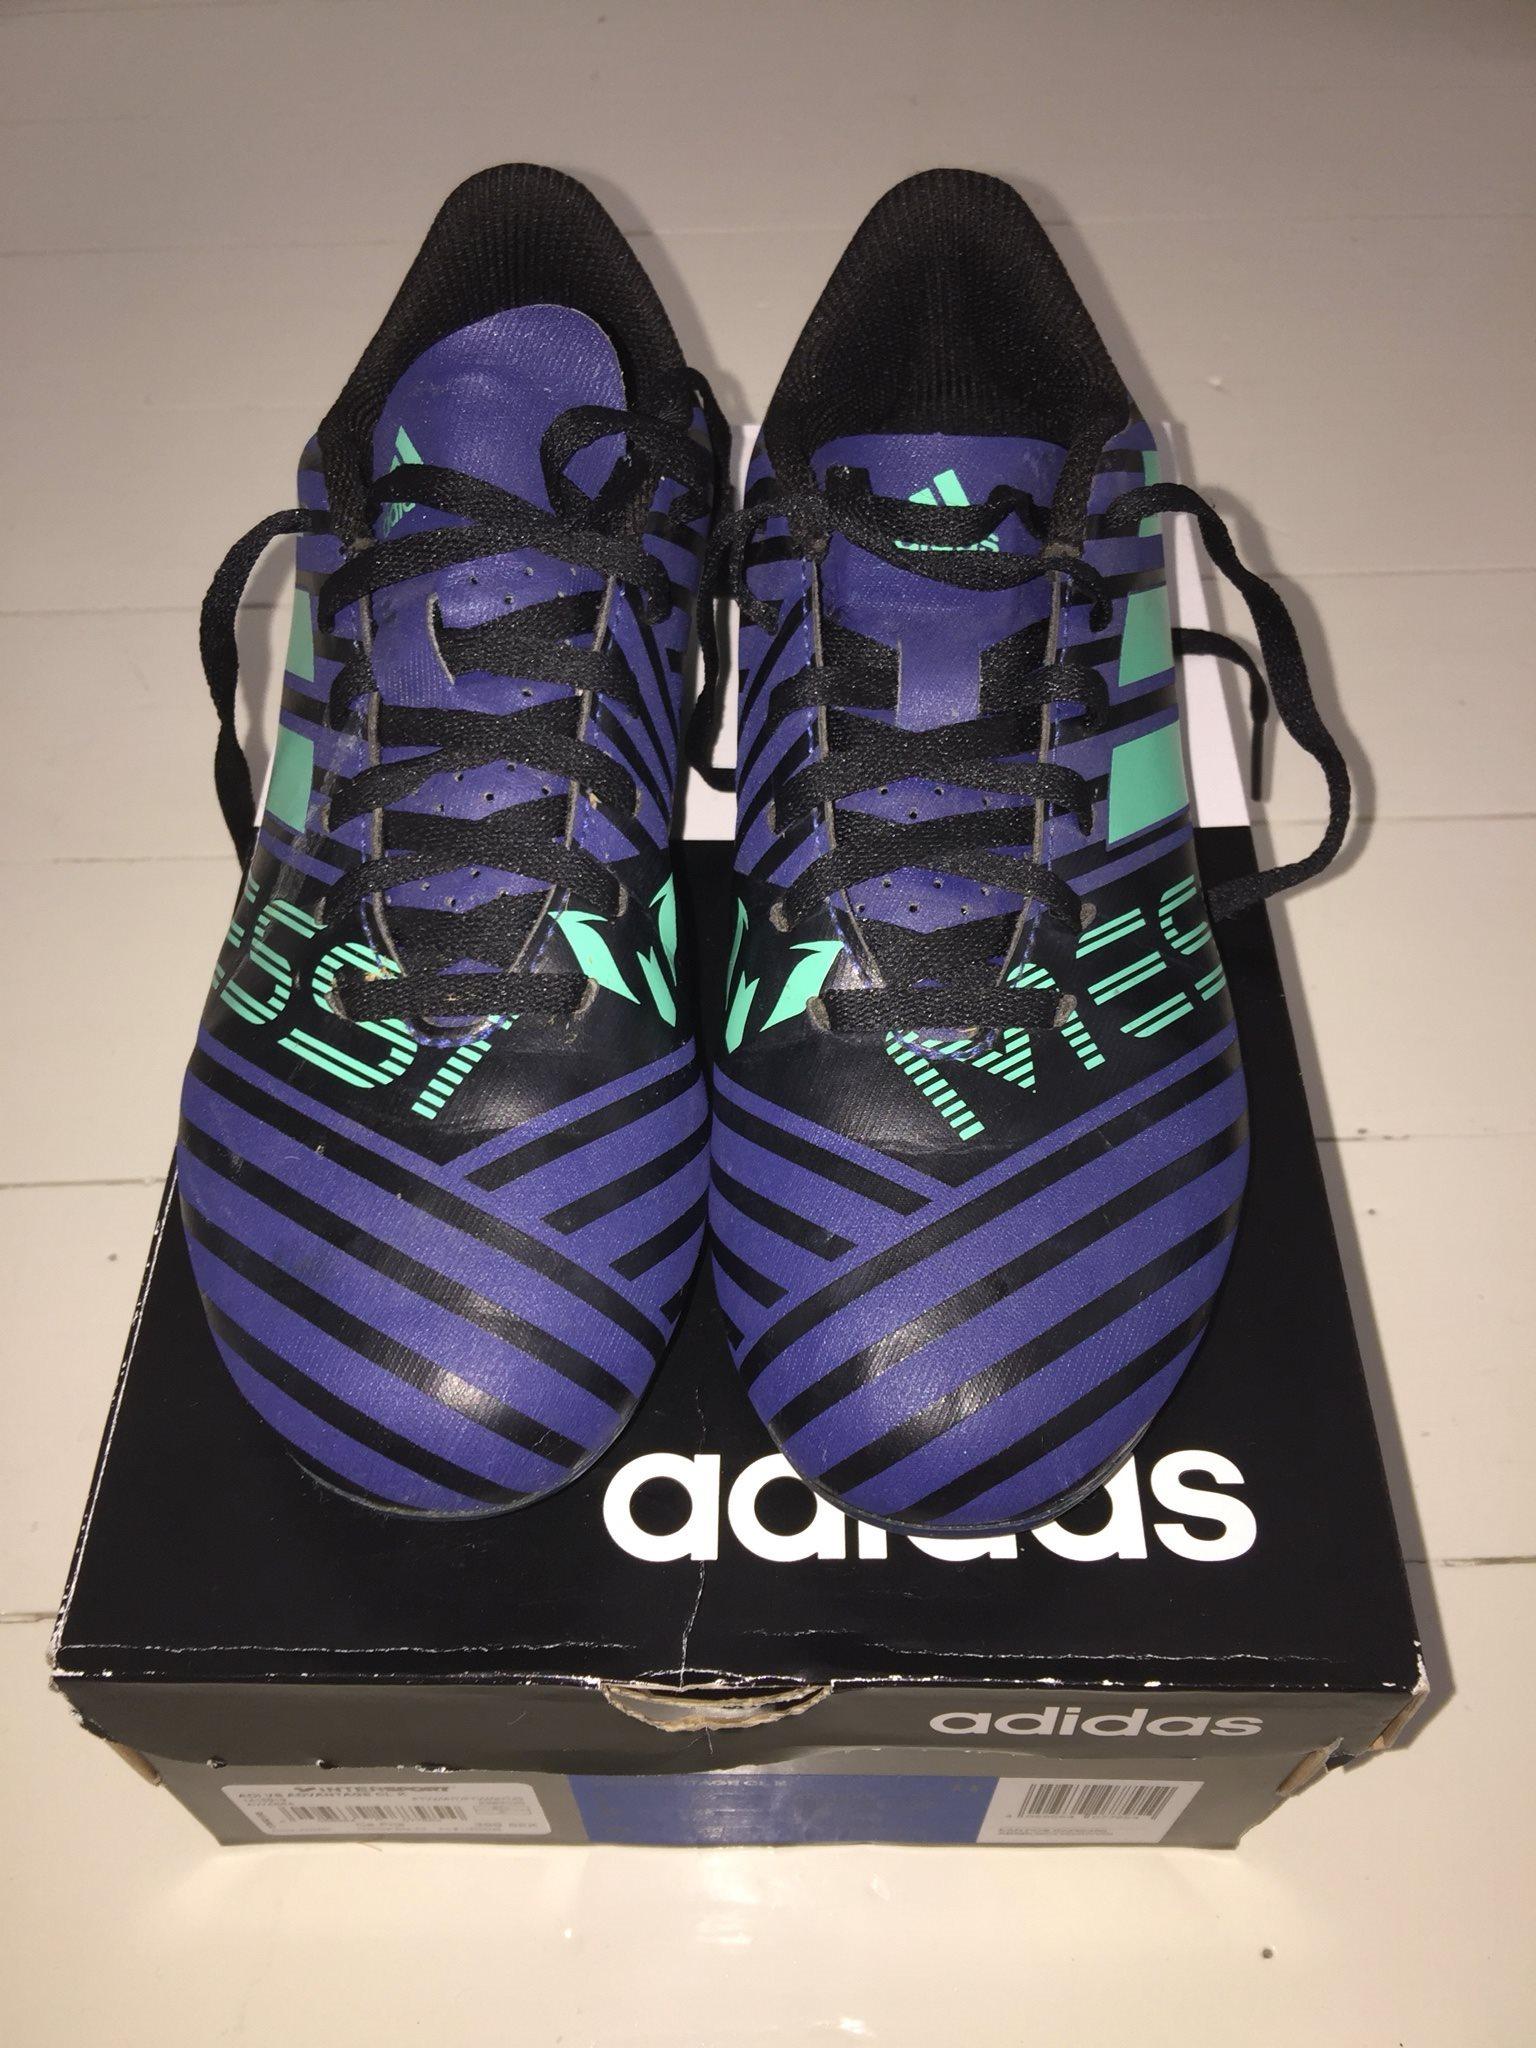 wholesale dealer 99a0e cb58a Storlek Fotbollsskor 317854796 Skor Fotboll Messi Adidas U1FxwqgF